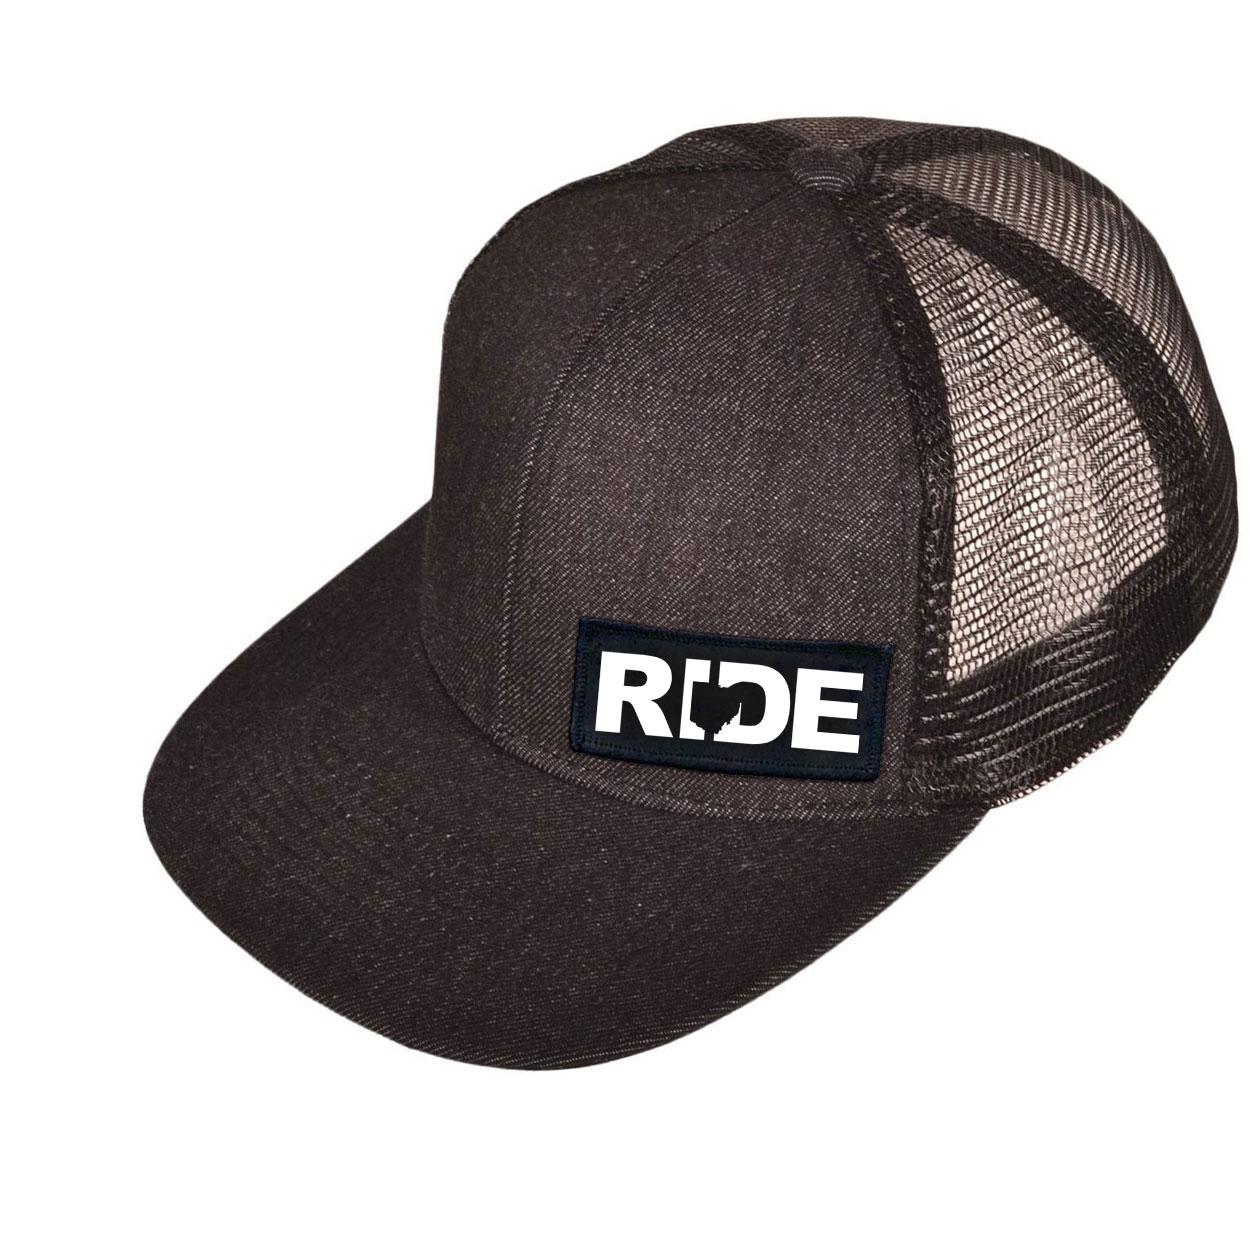 Ride Ohio Night Out Woven Patch Snapback Flat Brim Hat Black Denim (White Logo)